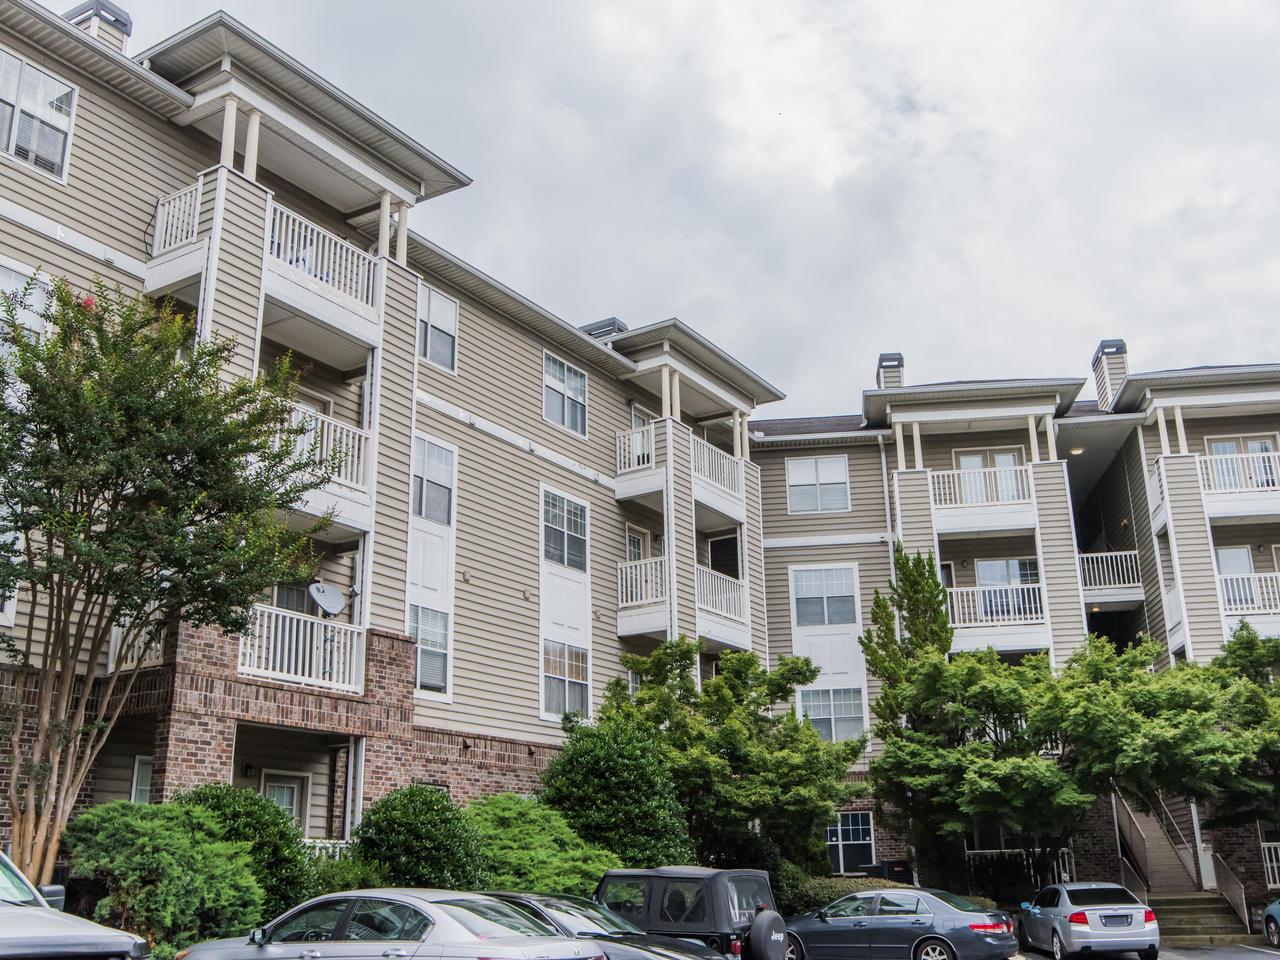 2700 Pine Tree Rd NE #2204 Atlanta GA 30324 – SOLD – $167,500